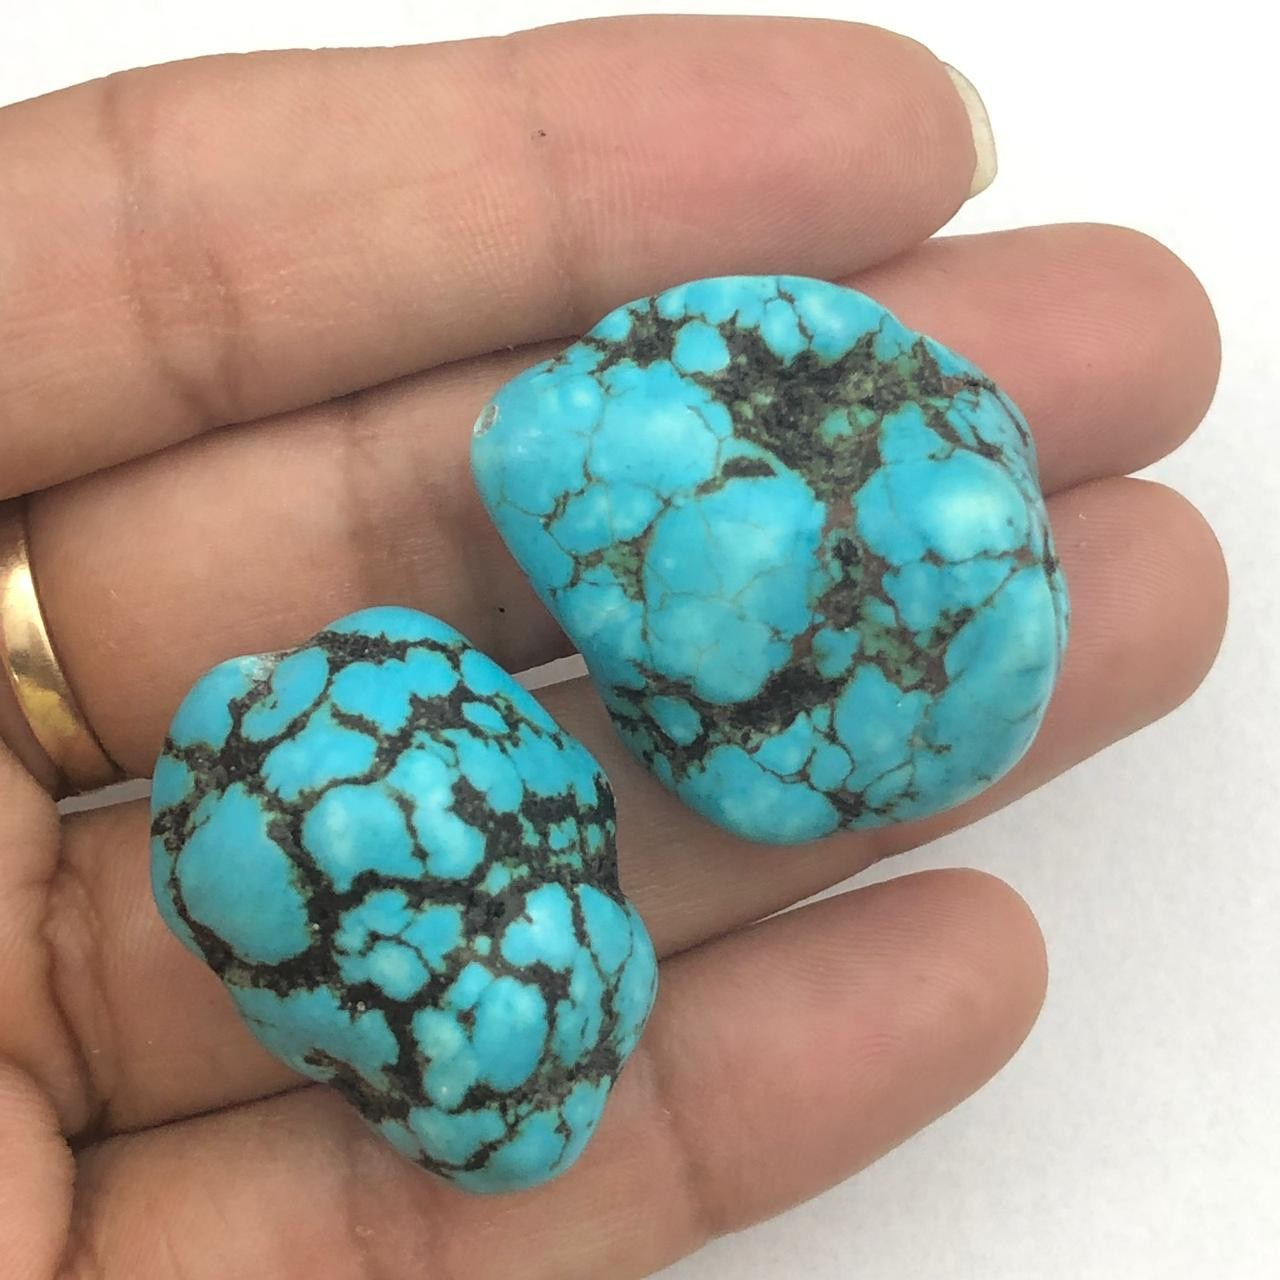 PN88 - Pedra Natural Howlita Turquesa Bruta - 01Unid